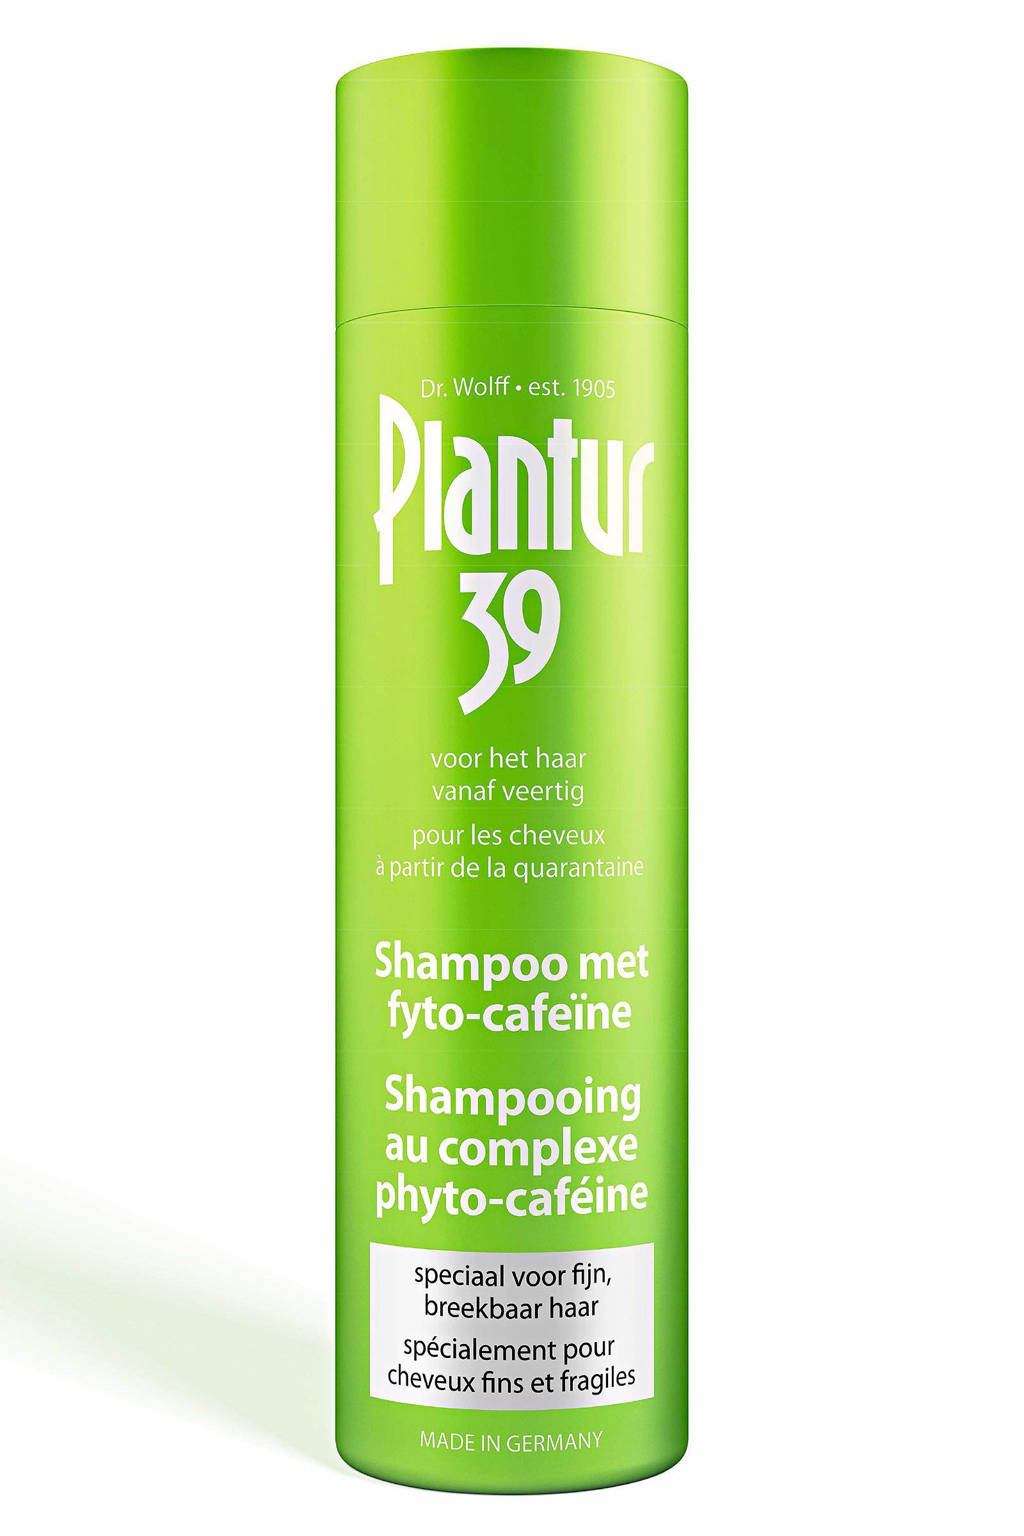 Plantur 39 Cafeïne shampoo - fijn en breekbaar haar